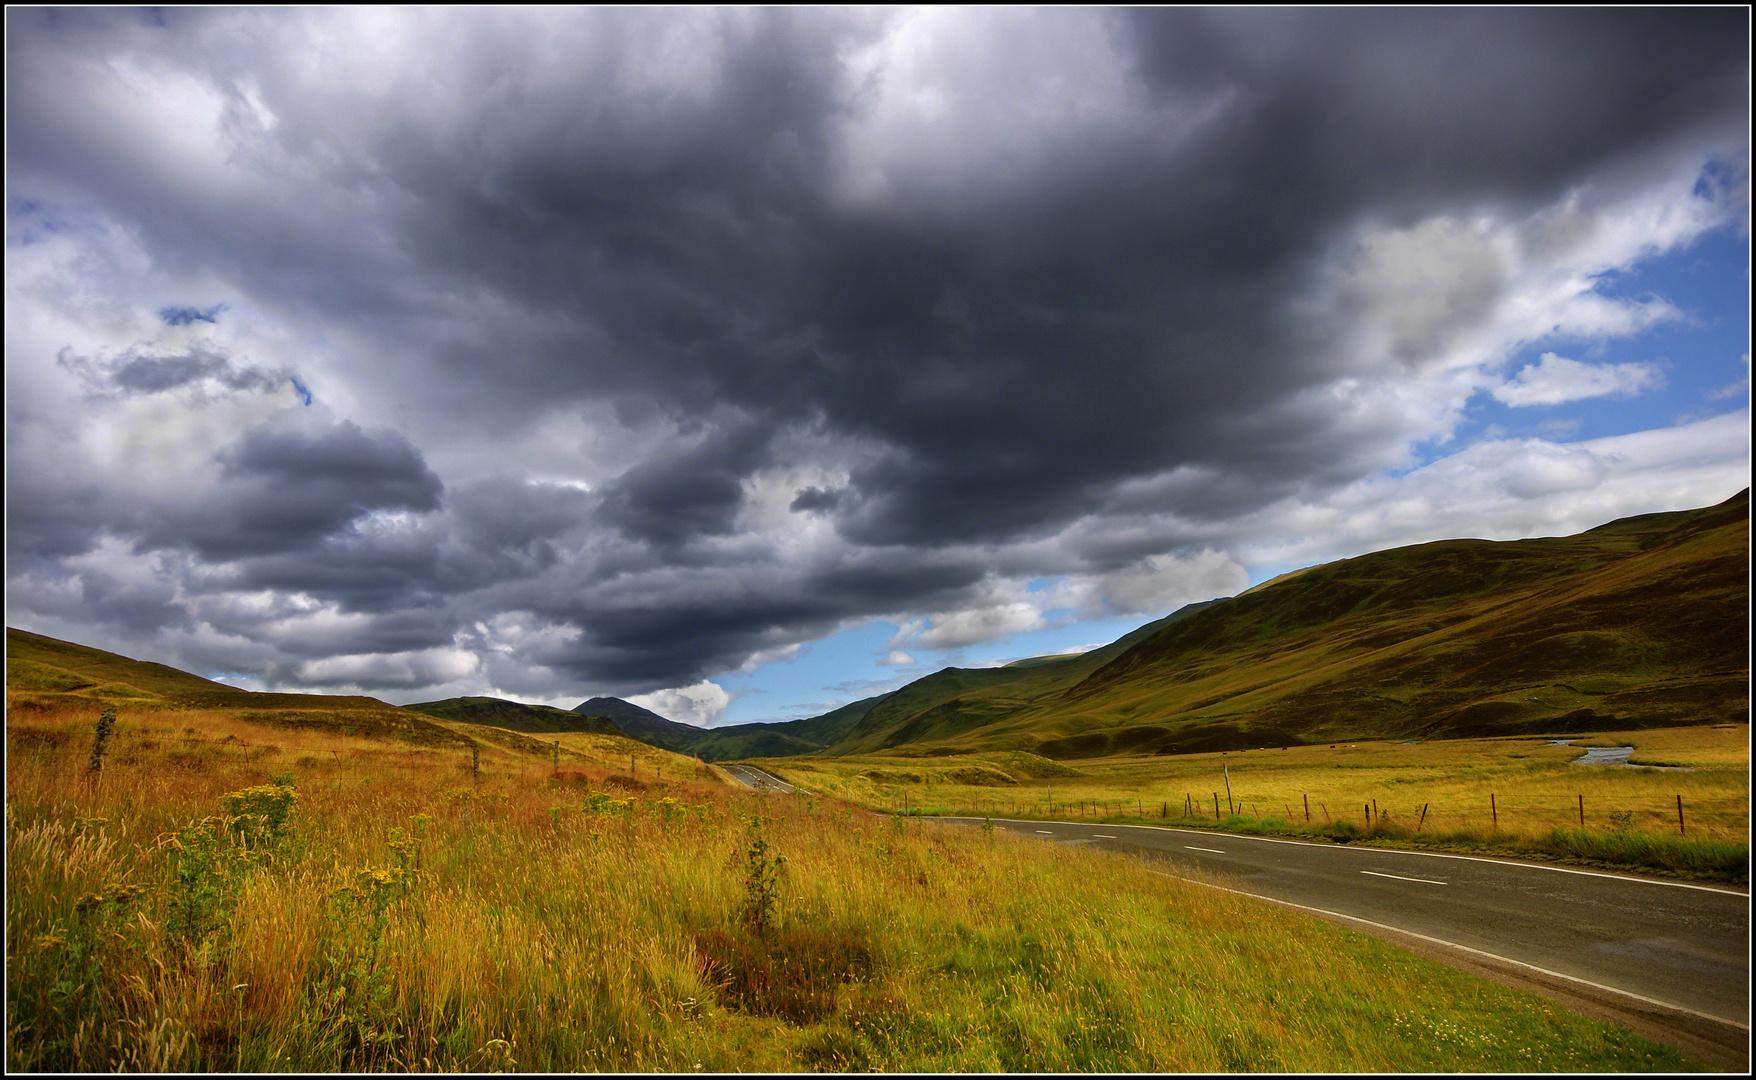 Scotland's National Tourist Route